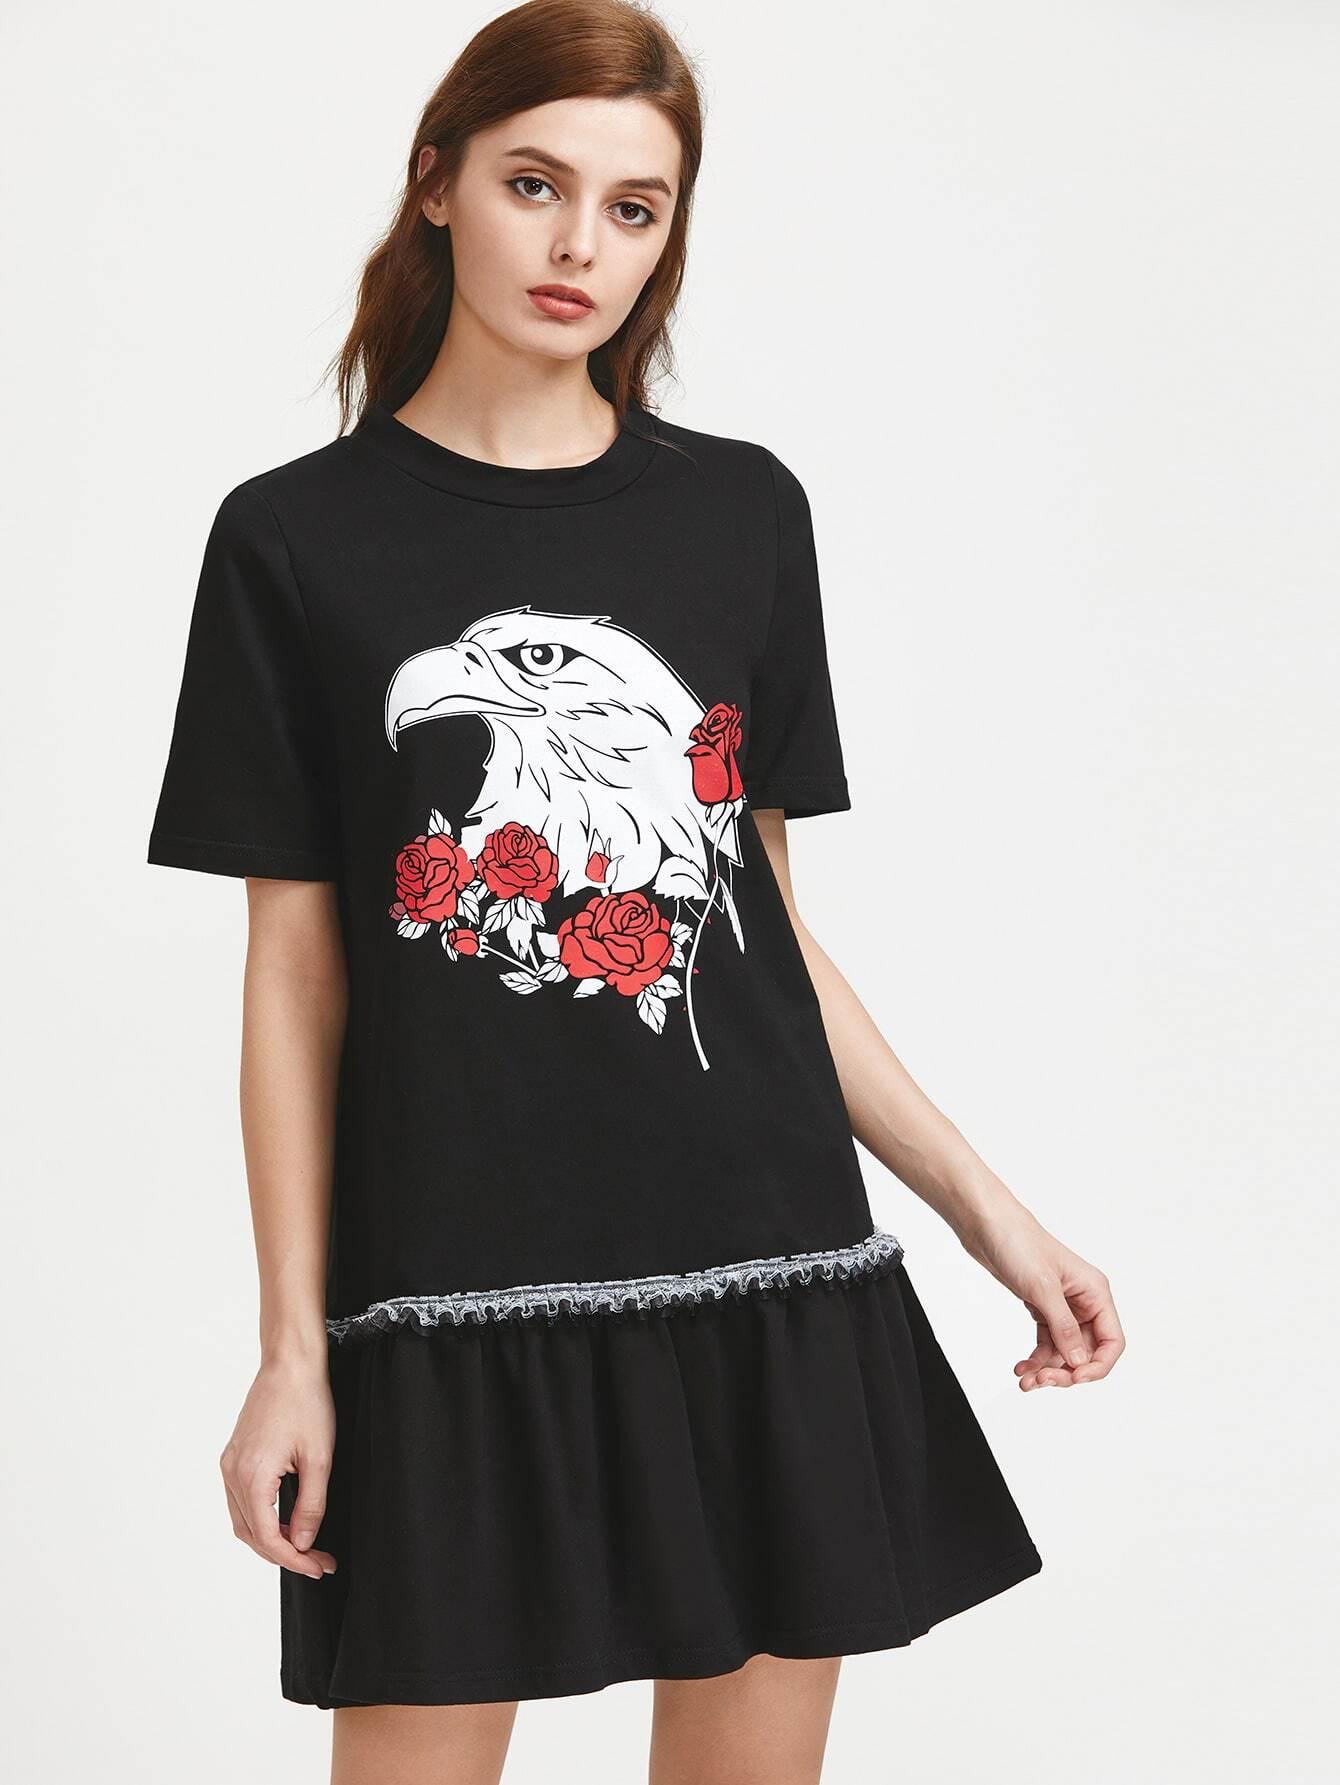 Фото Eagle Print Ruffle Trim Drop Waist Dress. Купить с доставкой